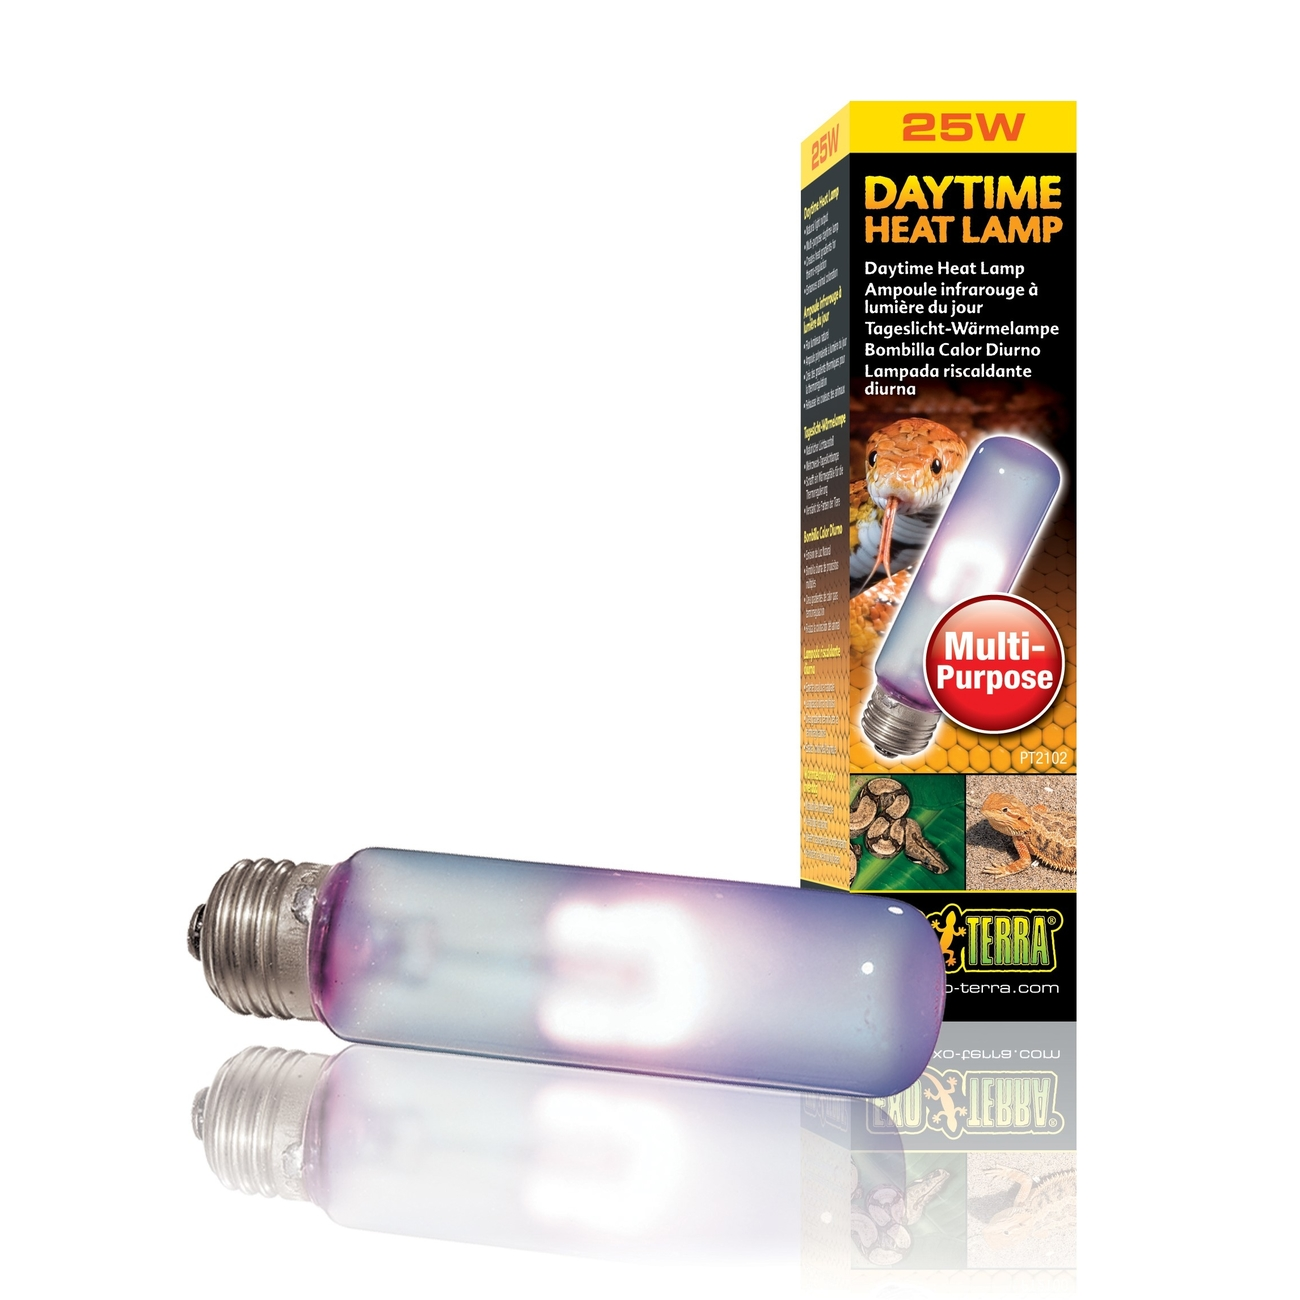 Exo Terra - Daytime Heat Lampe, Bild 3